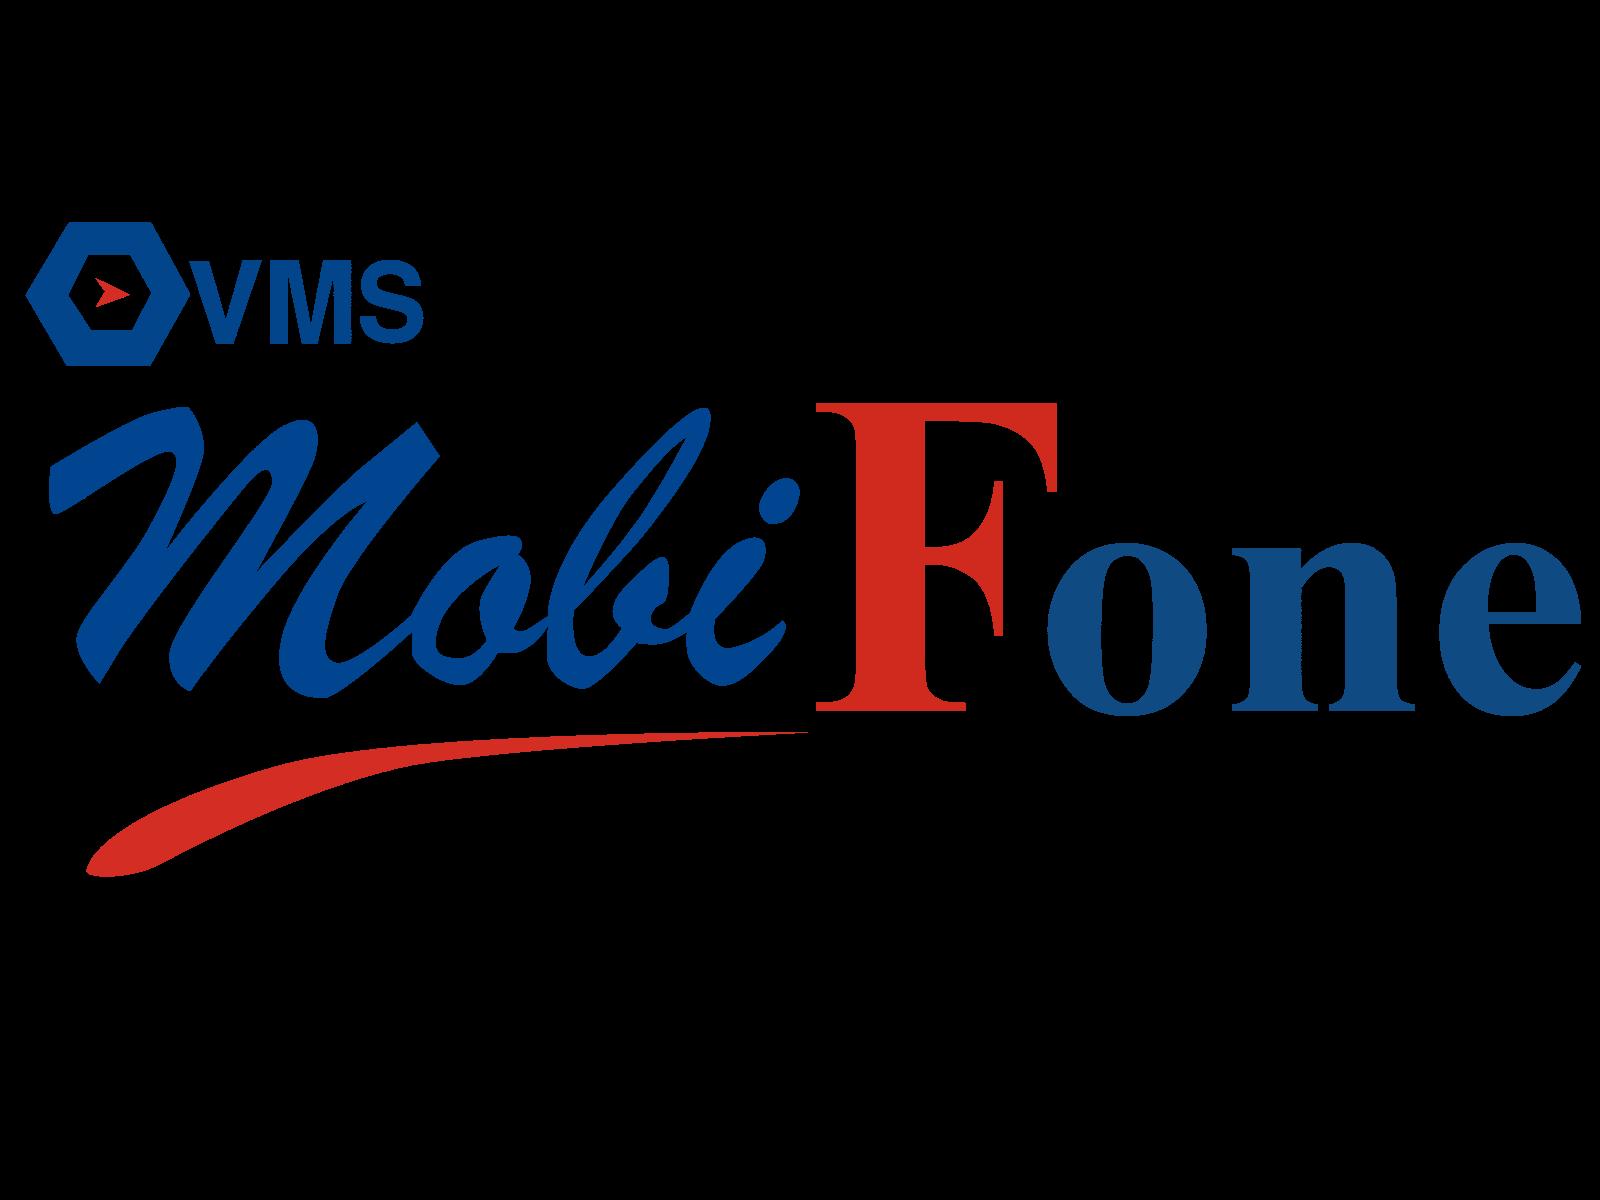 logo mobifone cũ